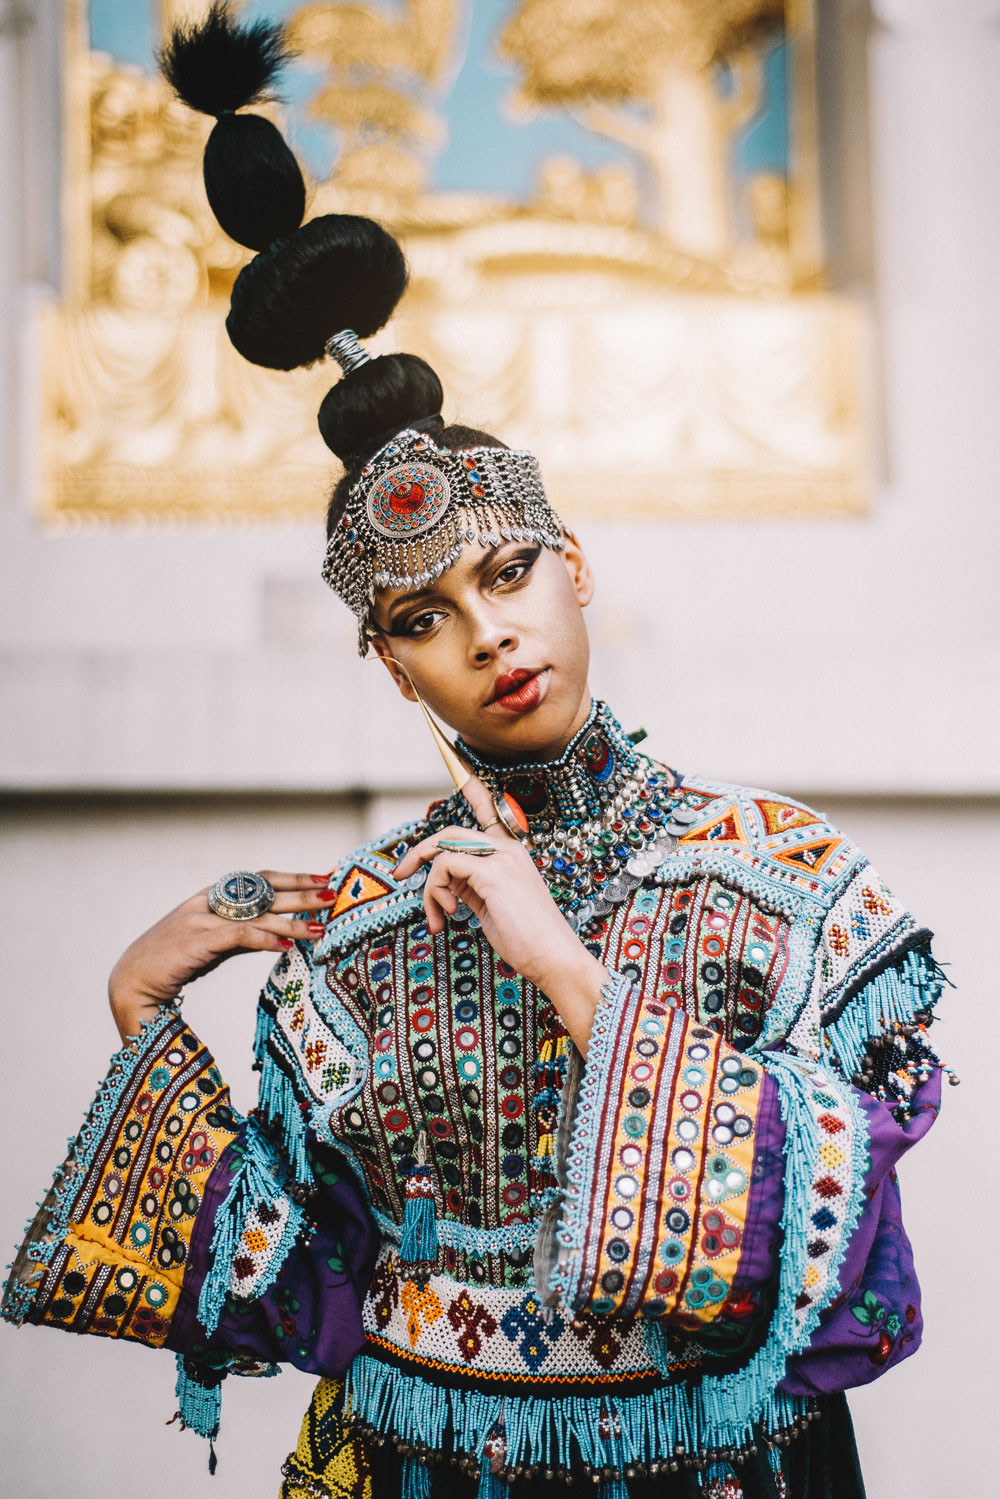 AVIZEH - Ethnic Afghan Jewellery & Clothing